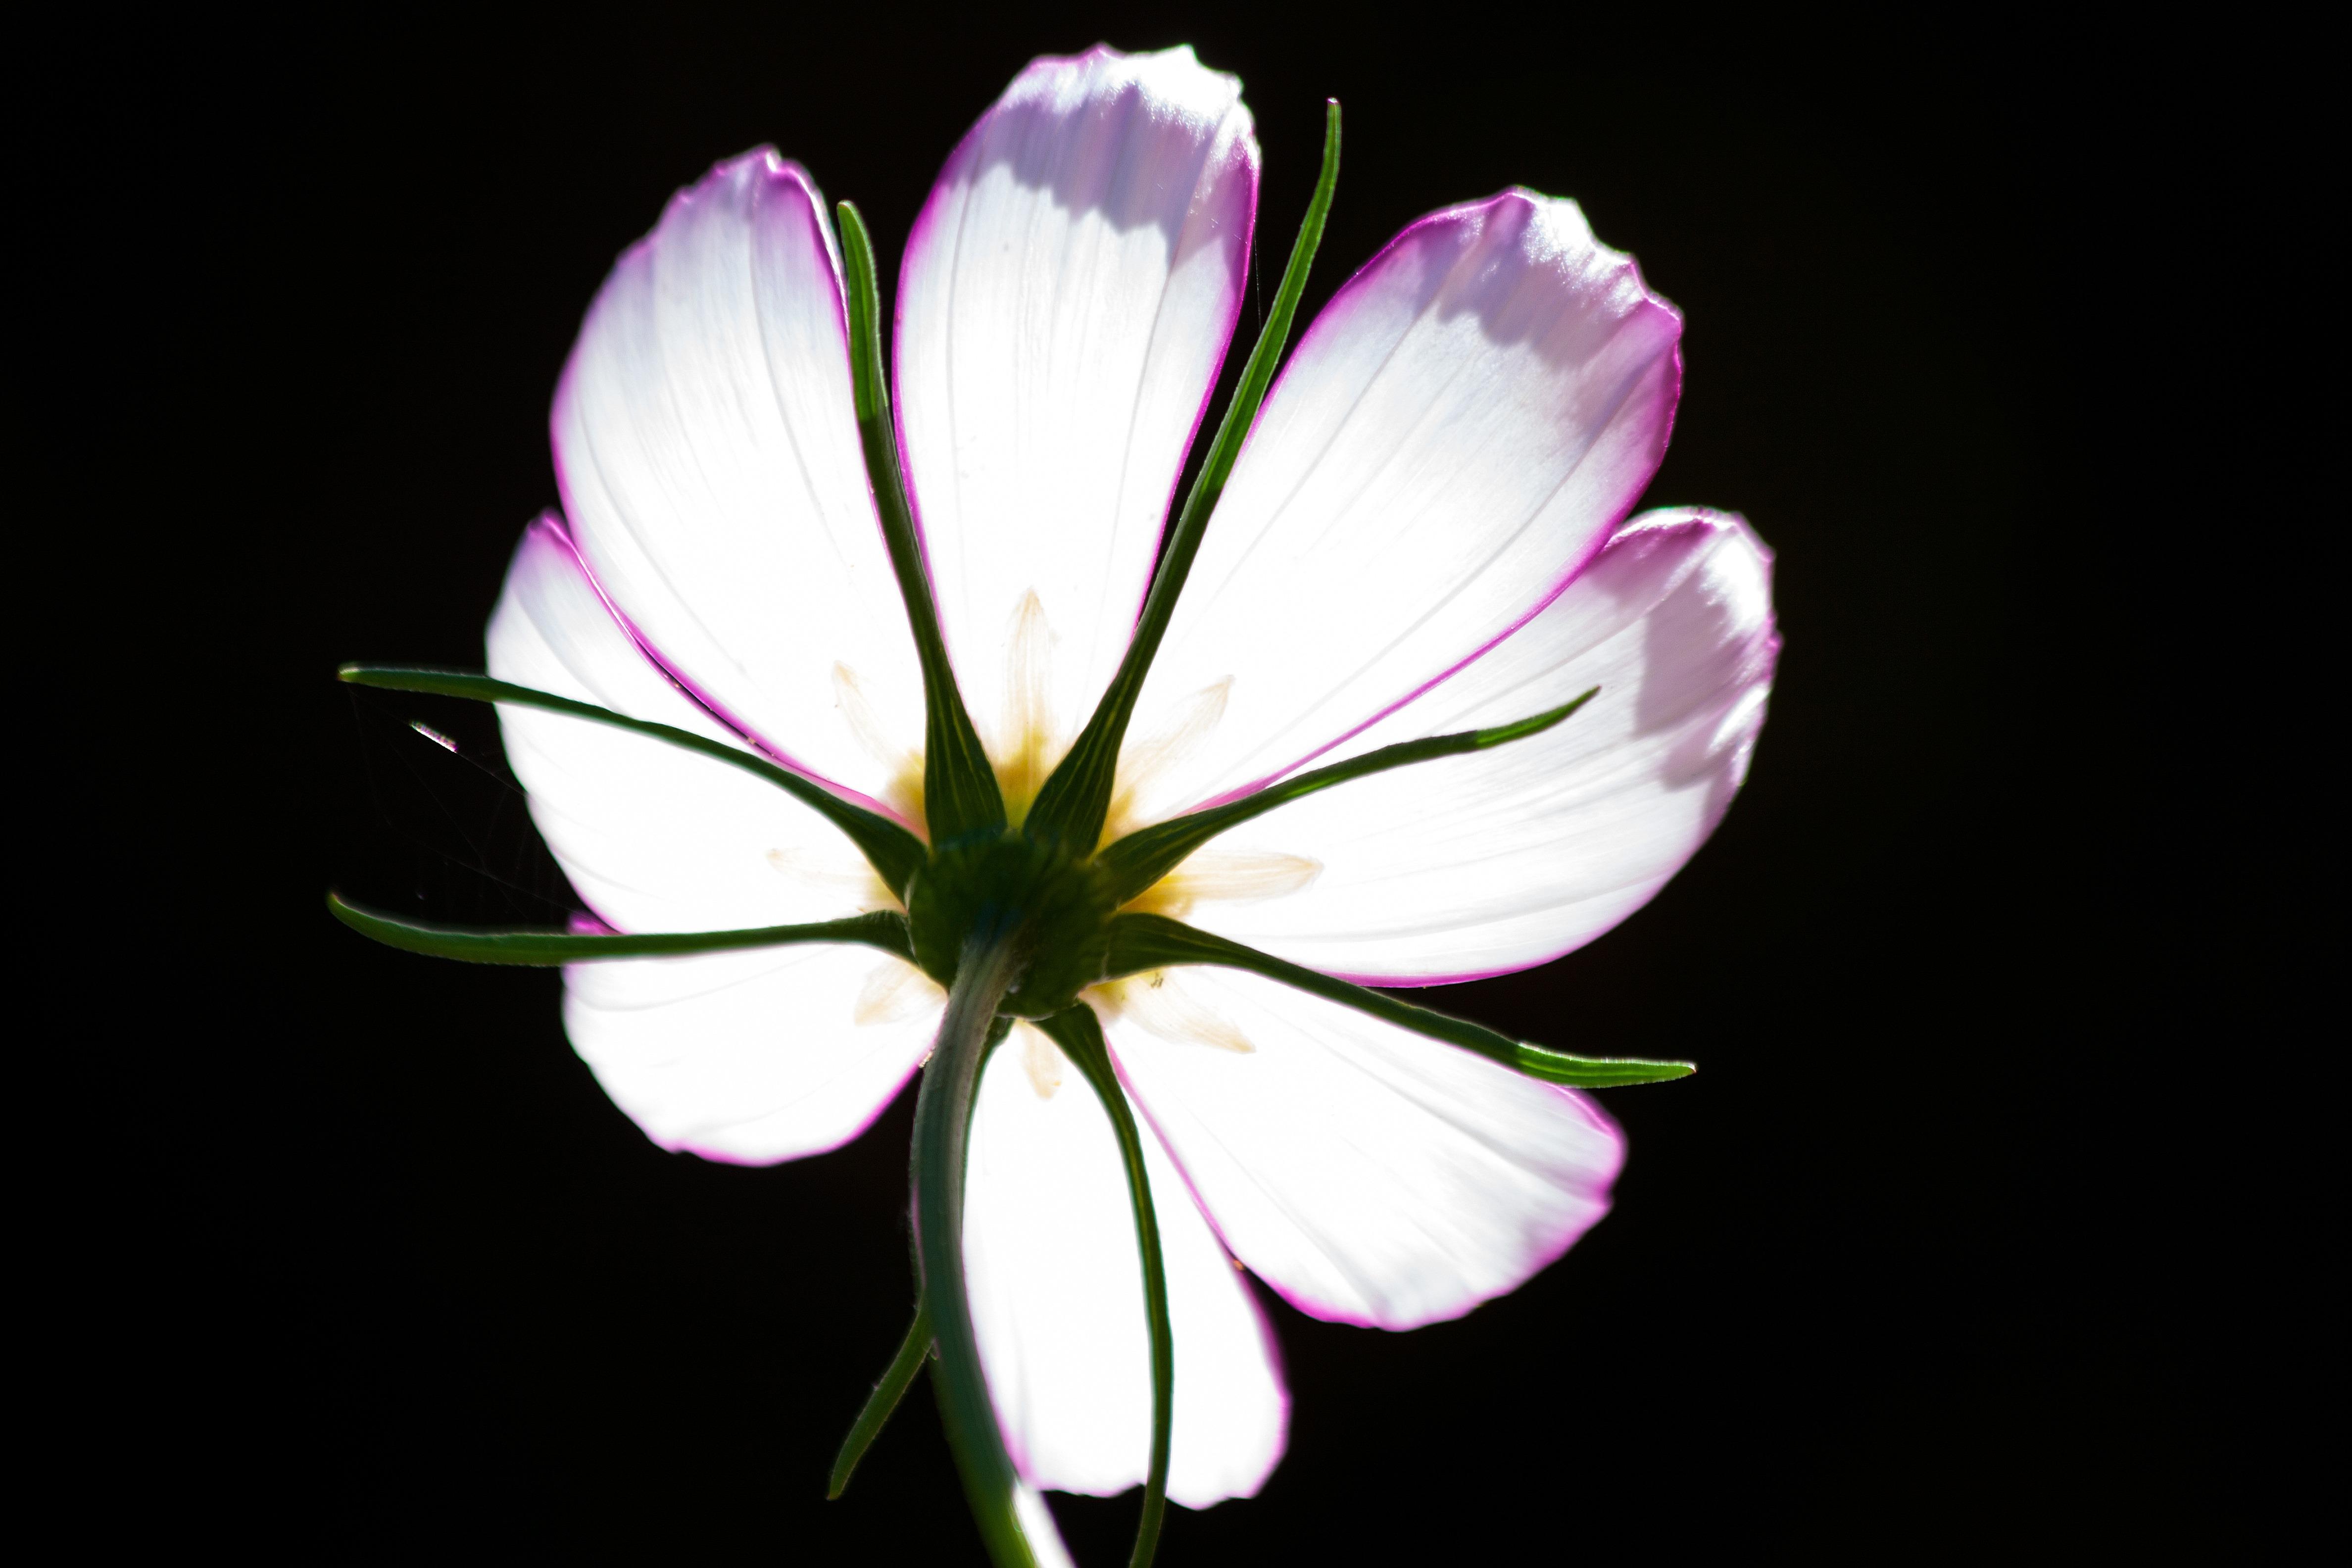 Kostenlose foto : blühen, Fotografie, Kosmos, Blume, Blütenblatt ...